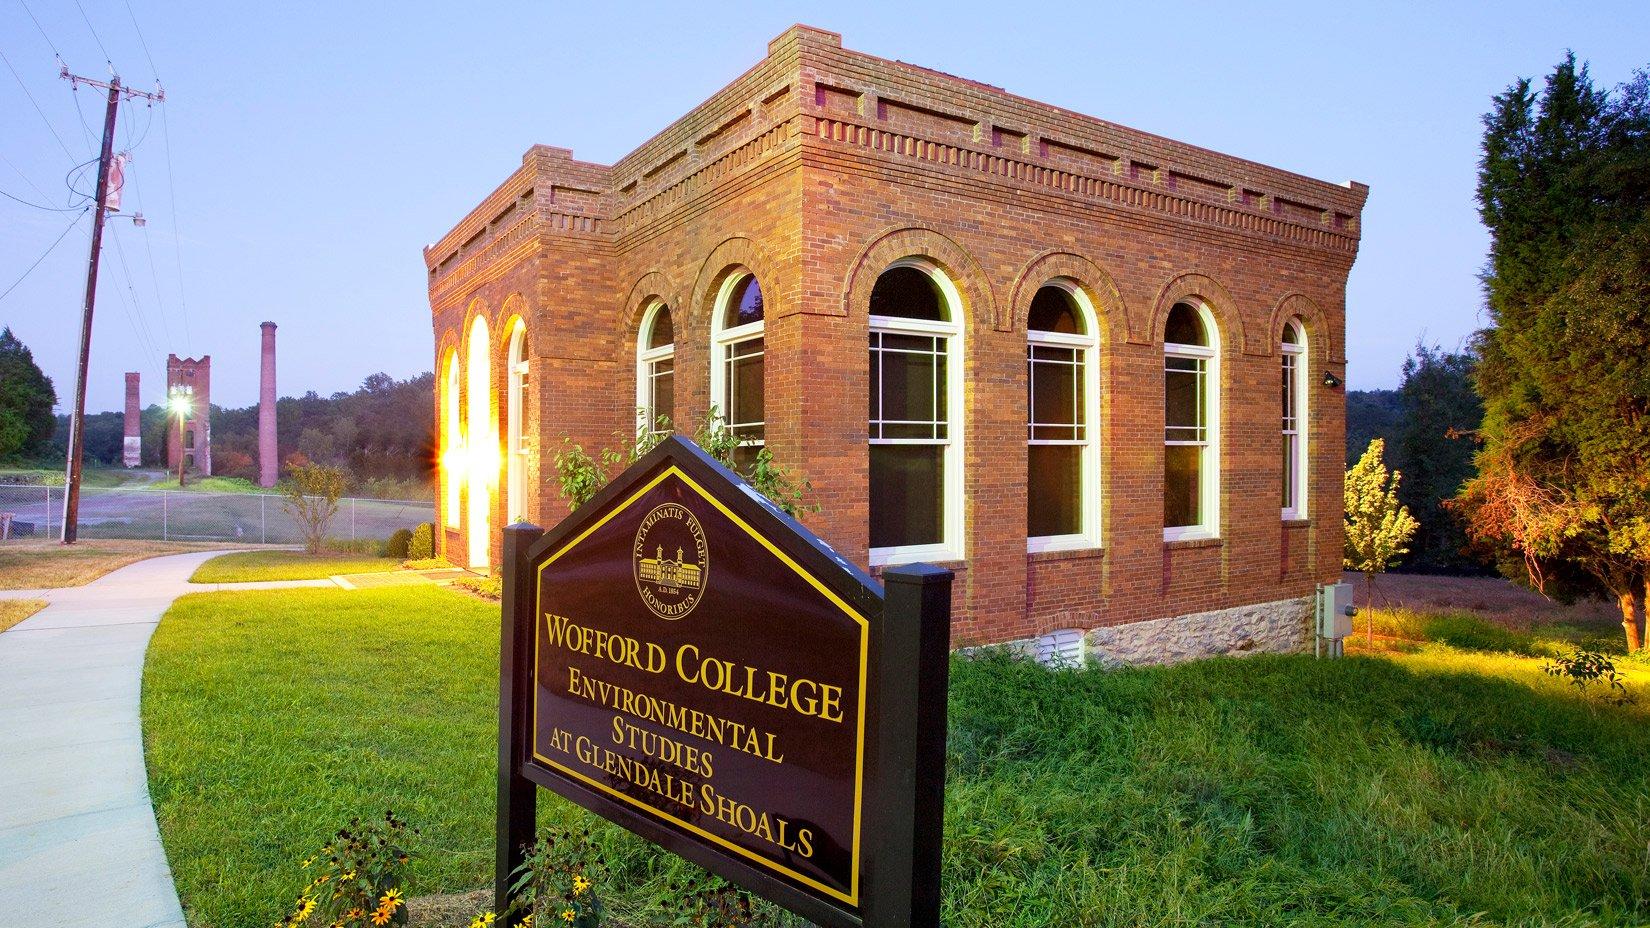 Wofford College, Goodall Environmental Center